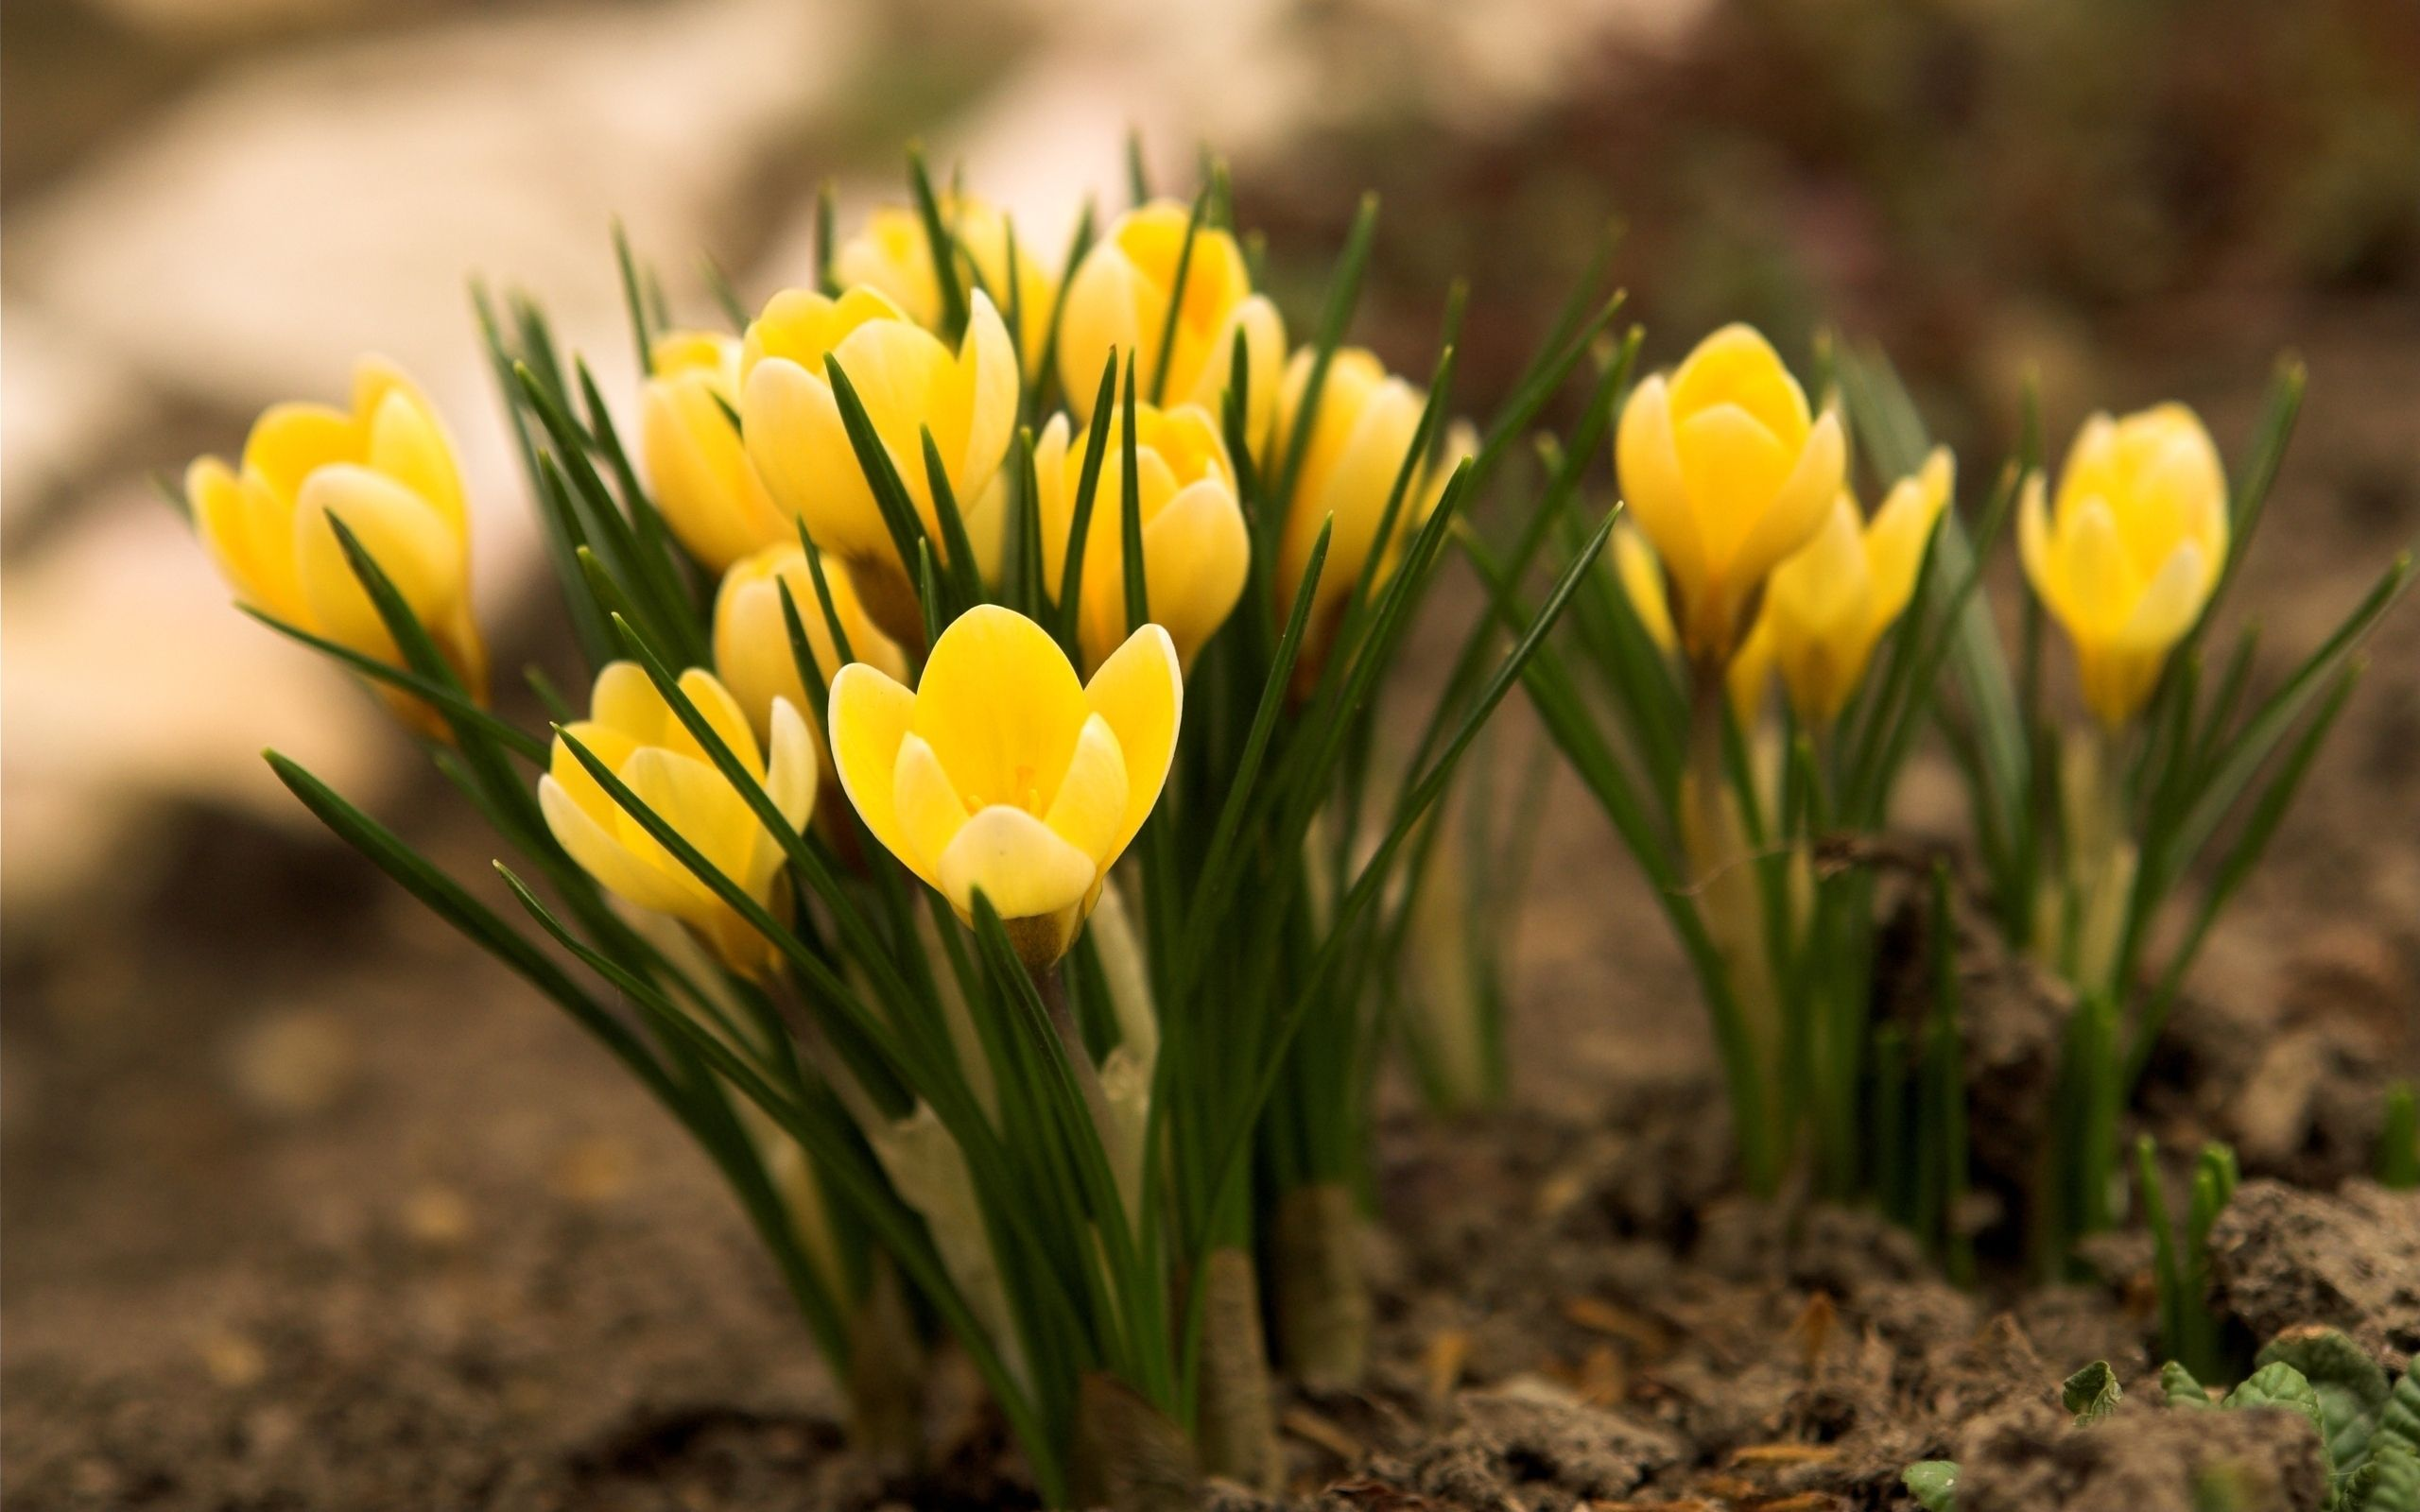 Yellow Crocus Flowers Photo Wallpaper 2560x1600 23752